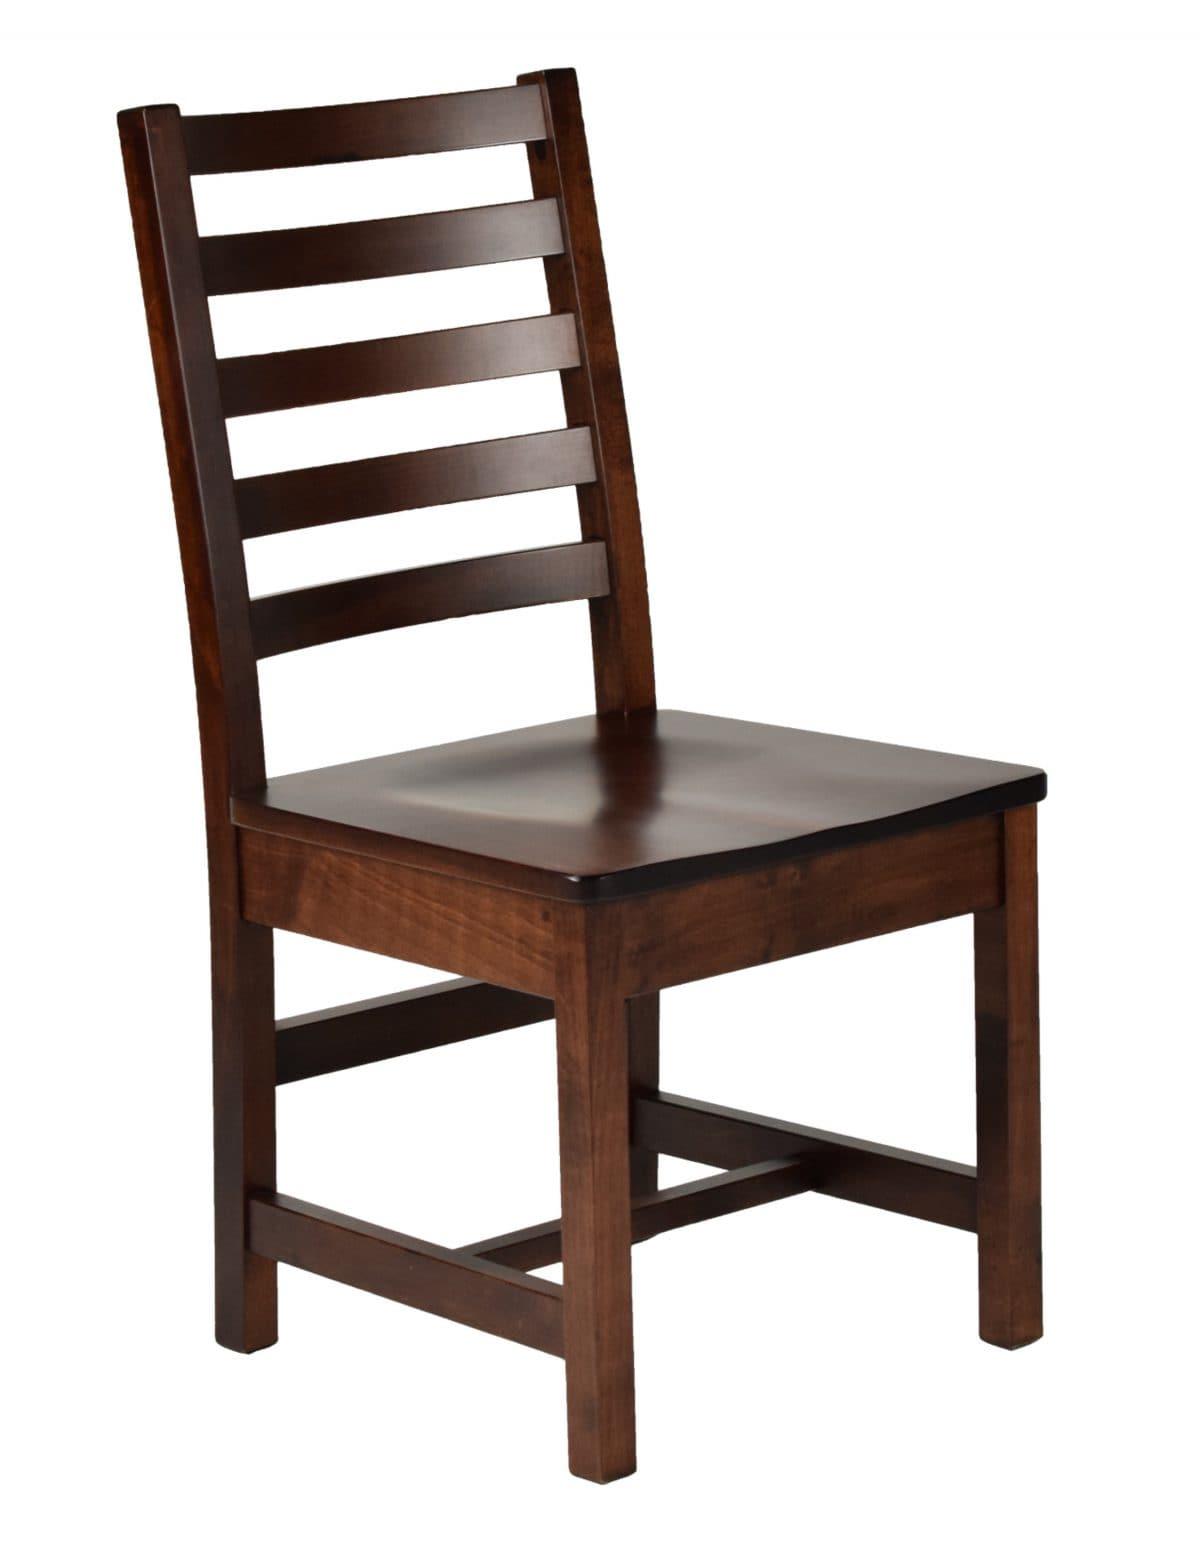 Photo of: HW Bristol Chair